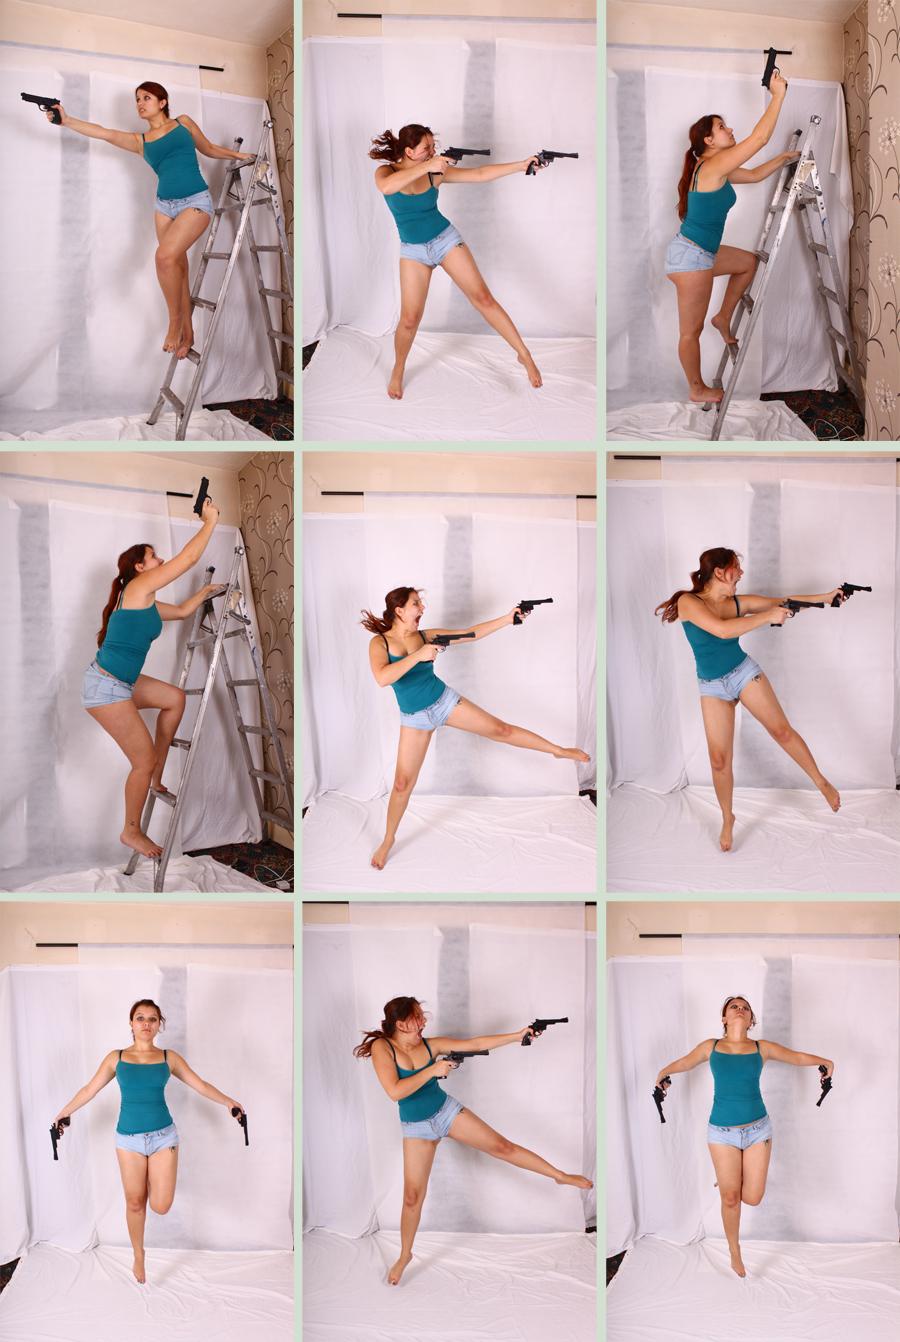 Gun Poses 2 by Tasastock